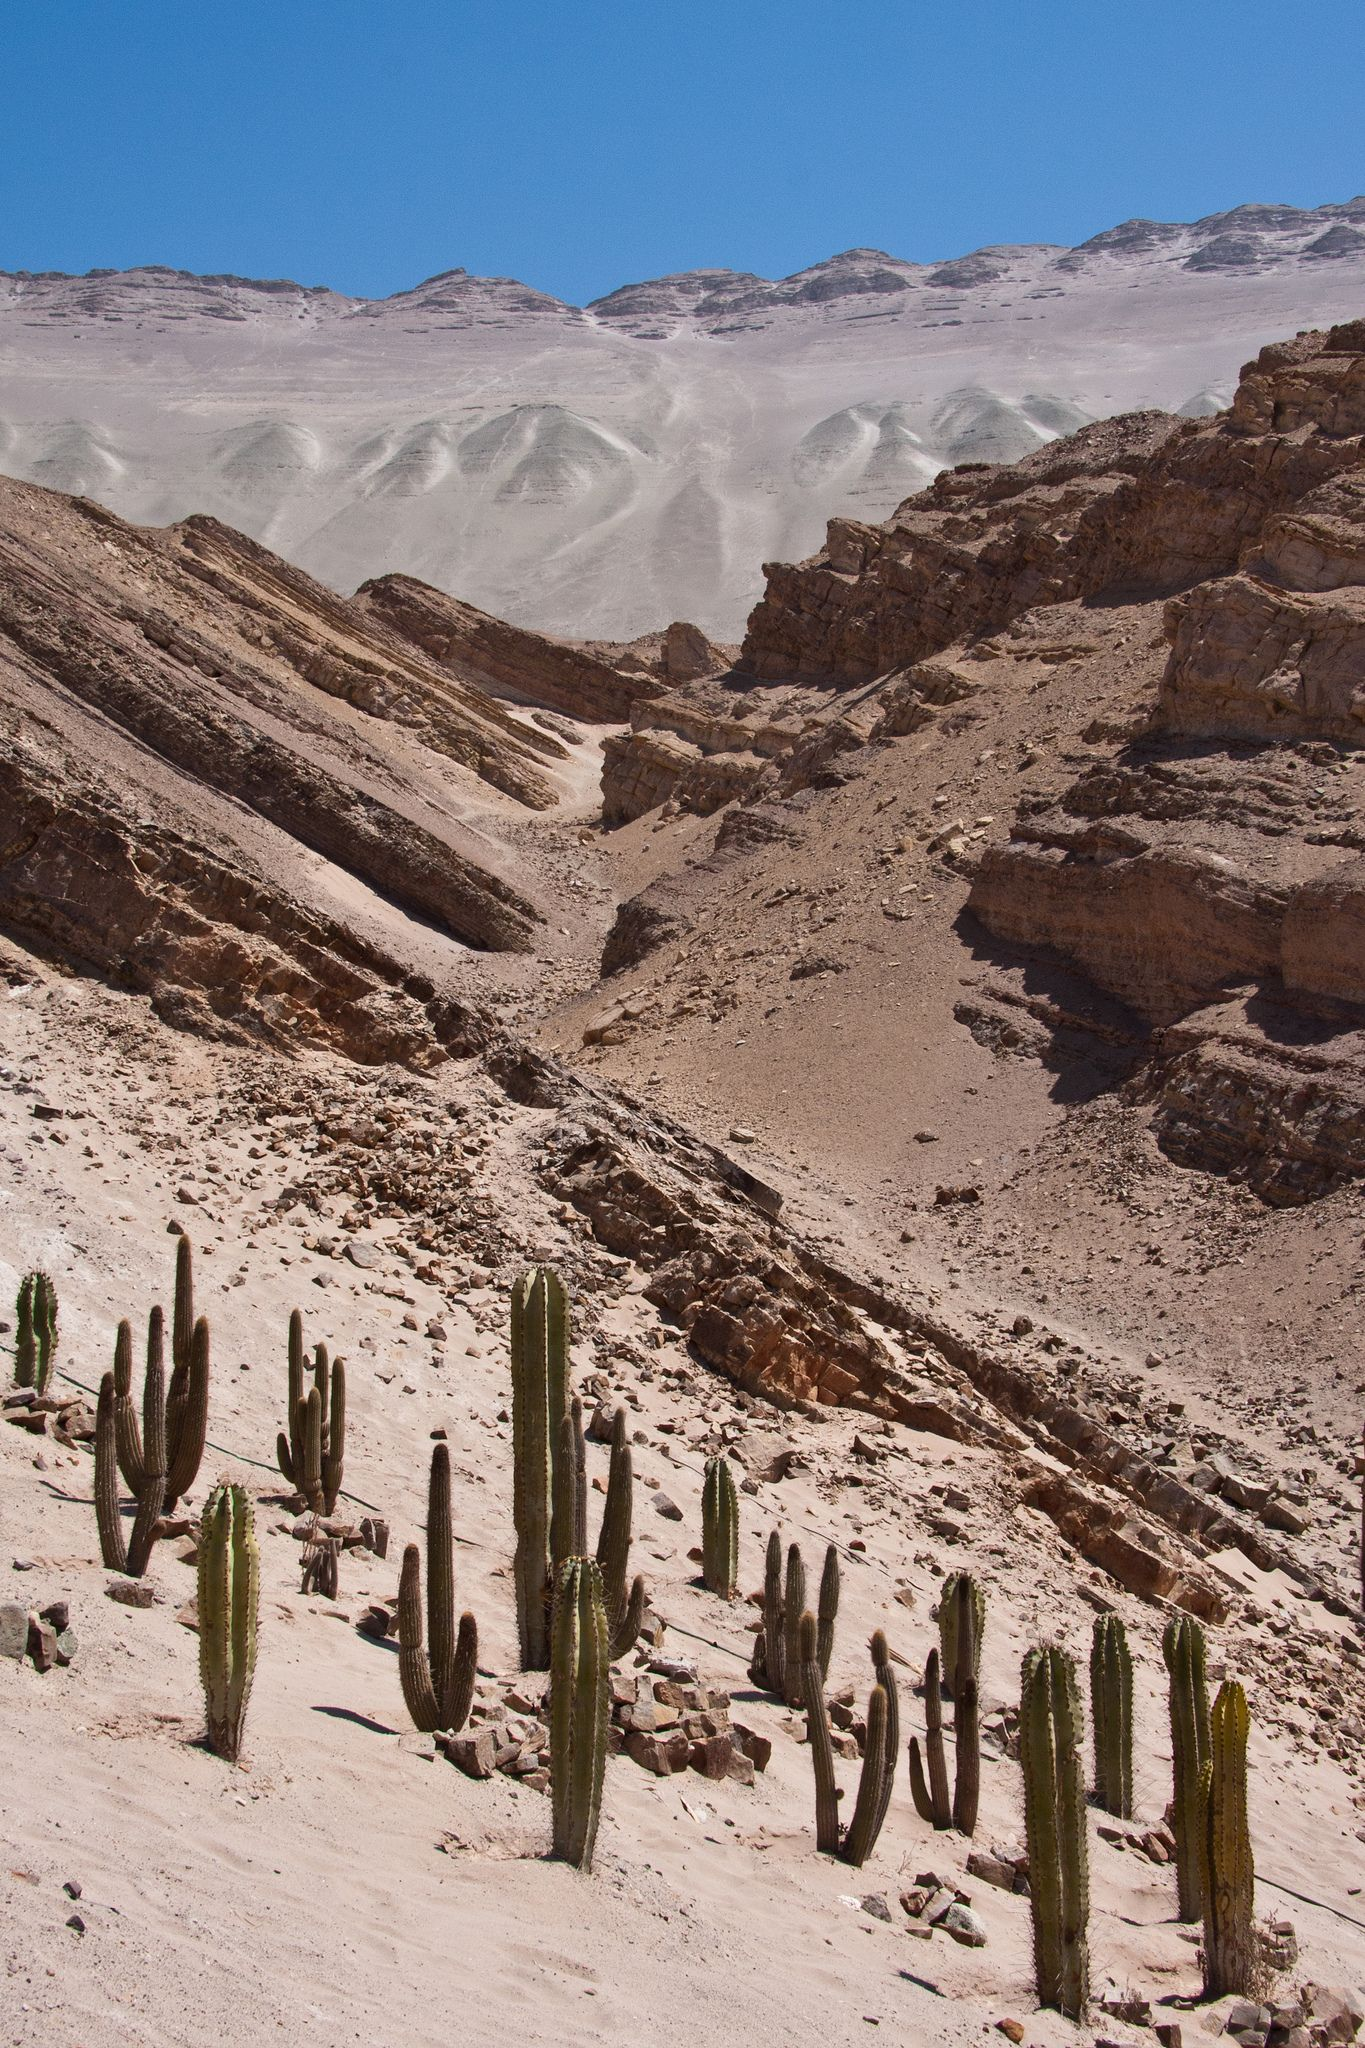 Parque Jurasico de Querulpa Perú